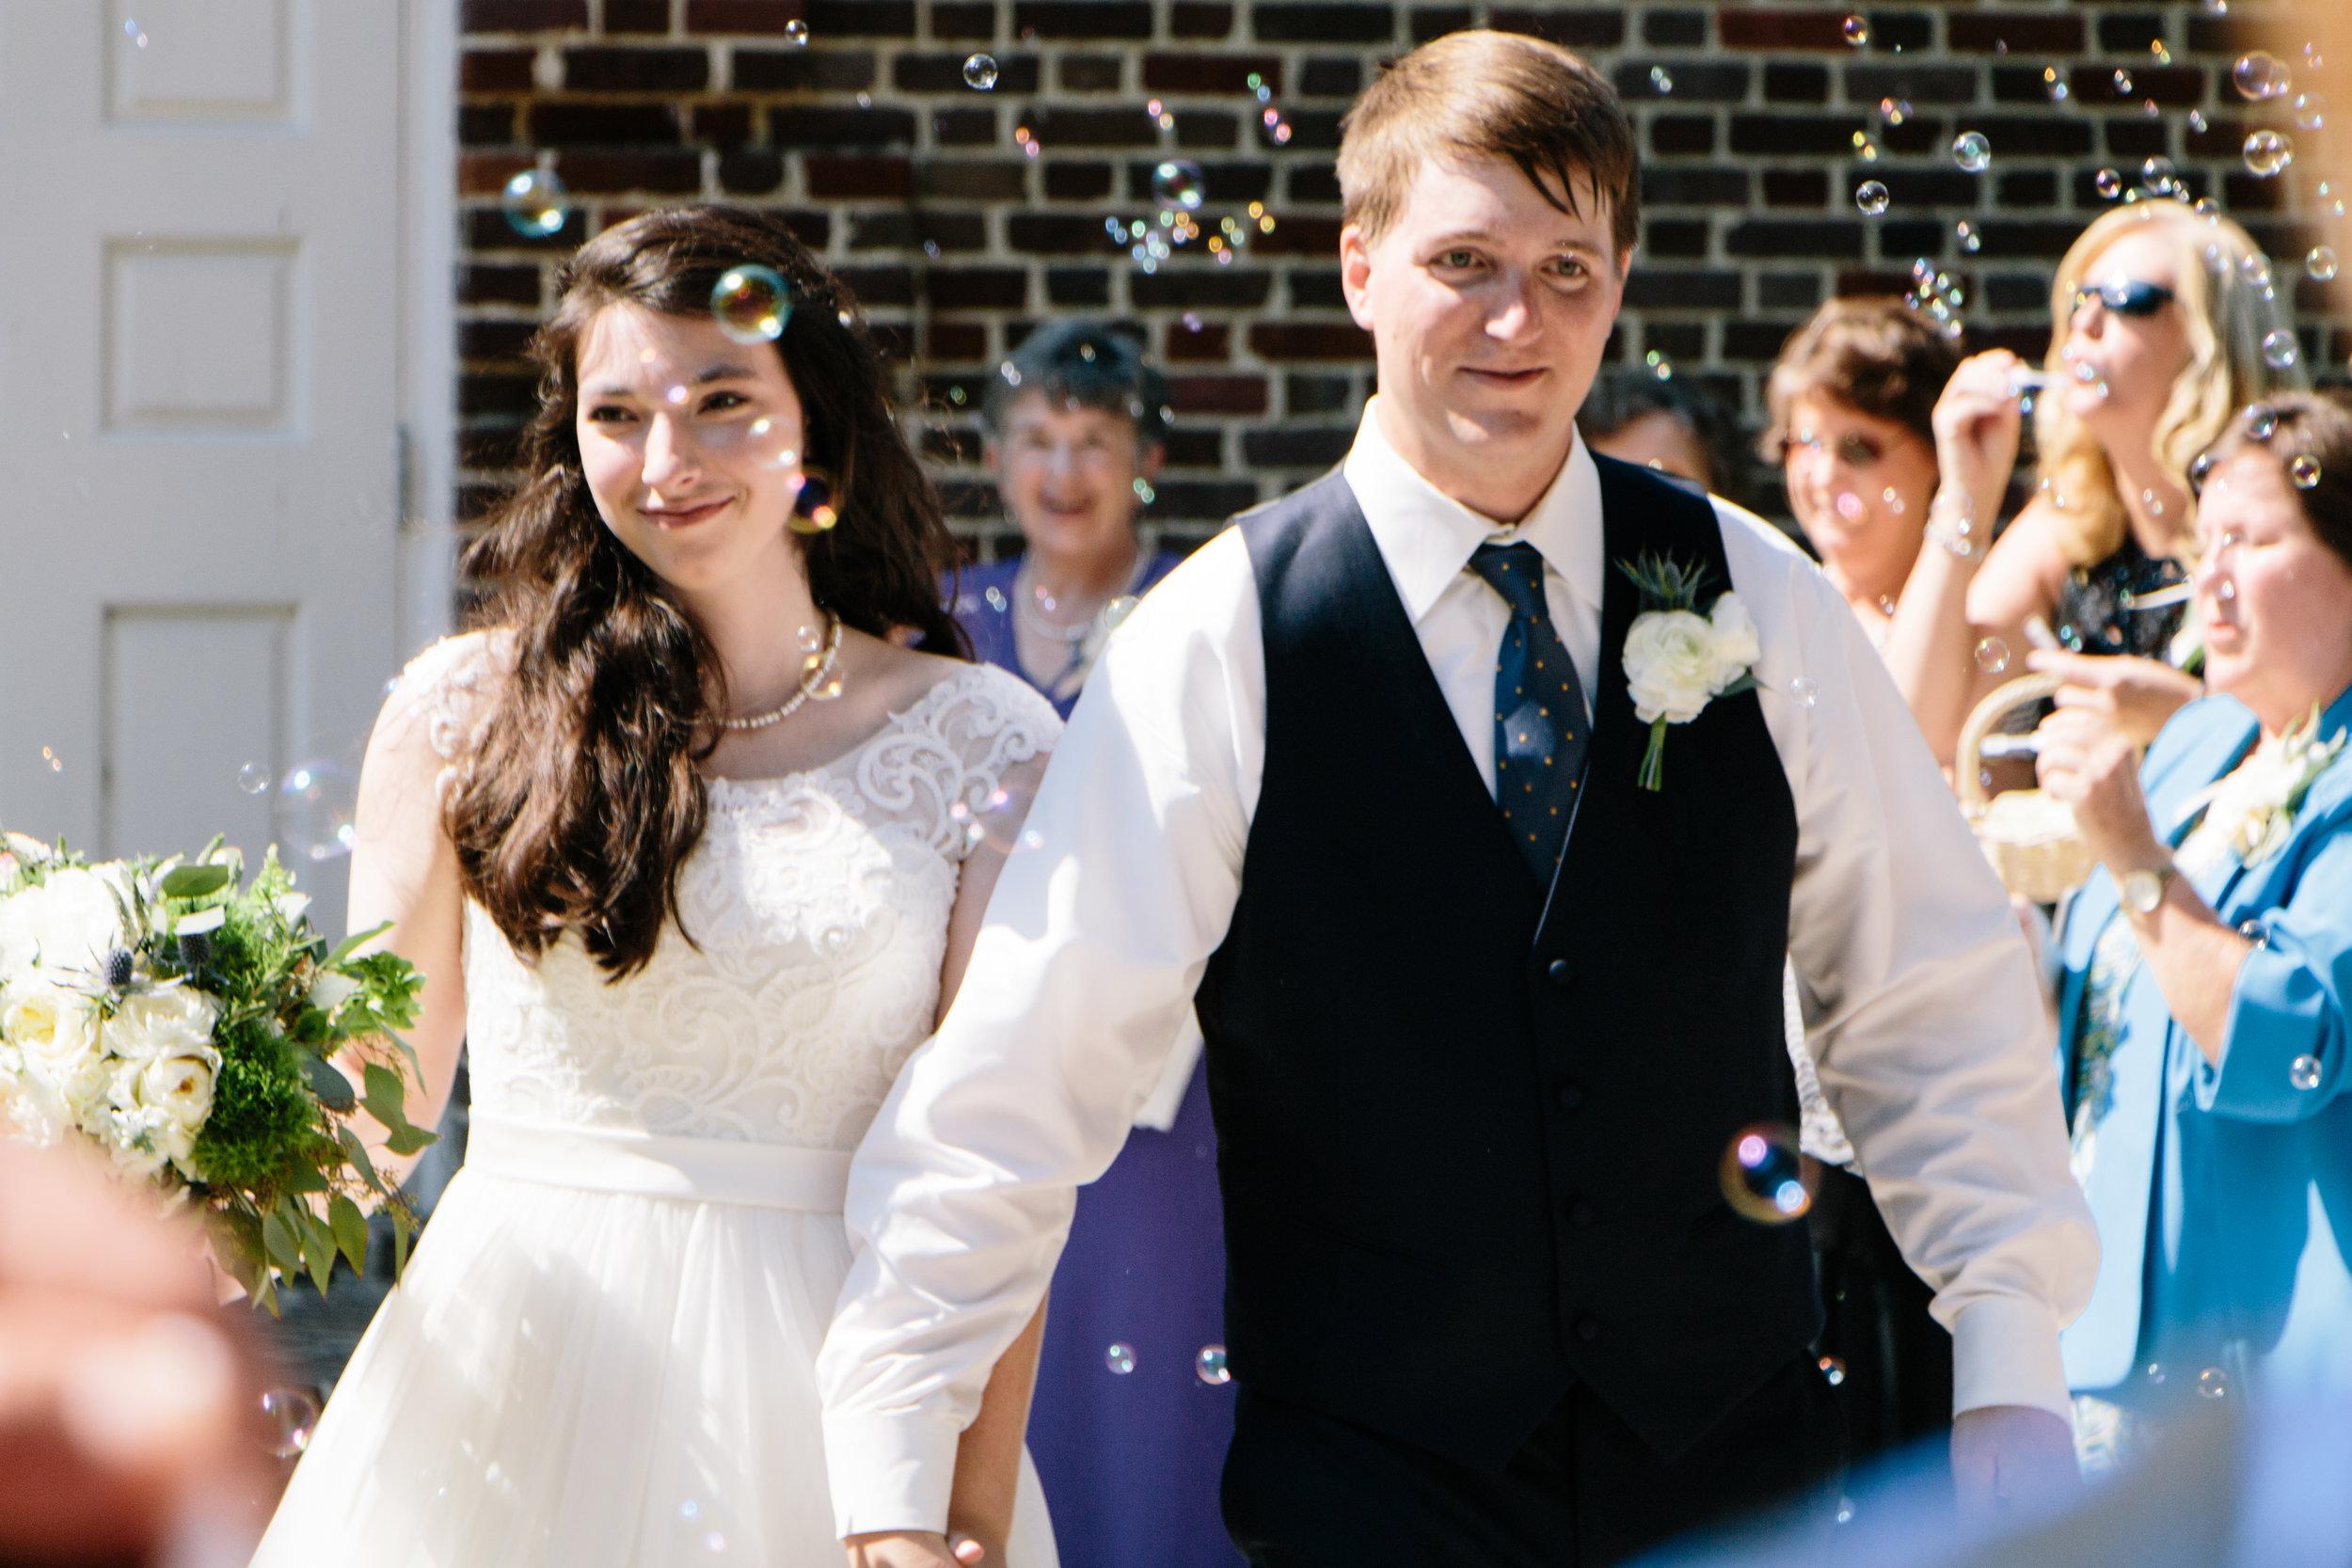 amanda-and-matt-bethesda-savannah-georgia-wedding-june-2016-m-newsom-photography-+(822+of+159).jpg